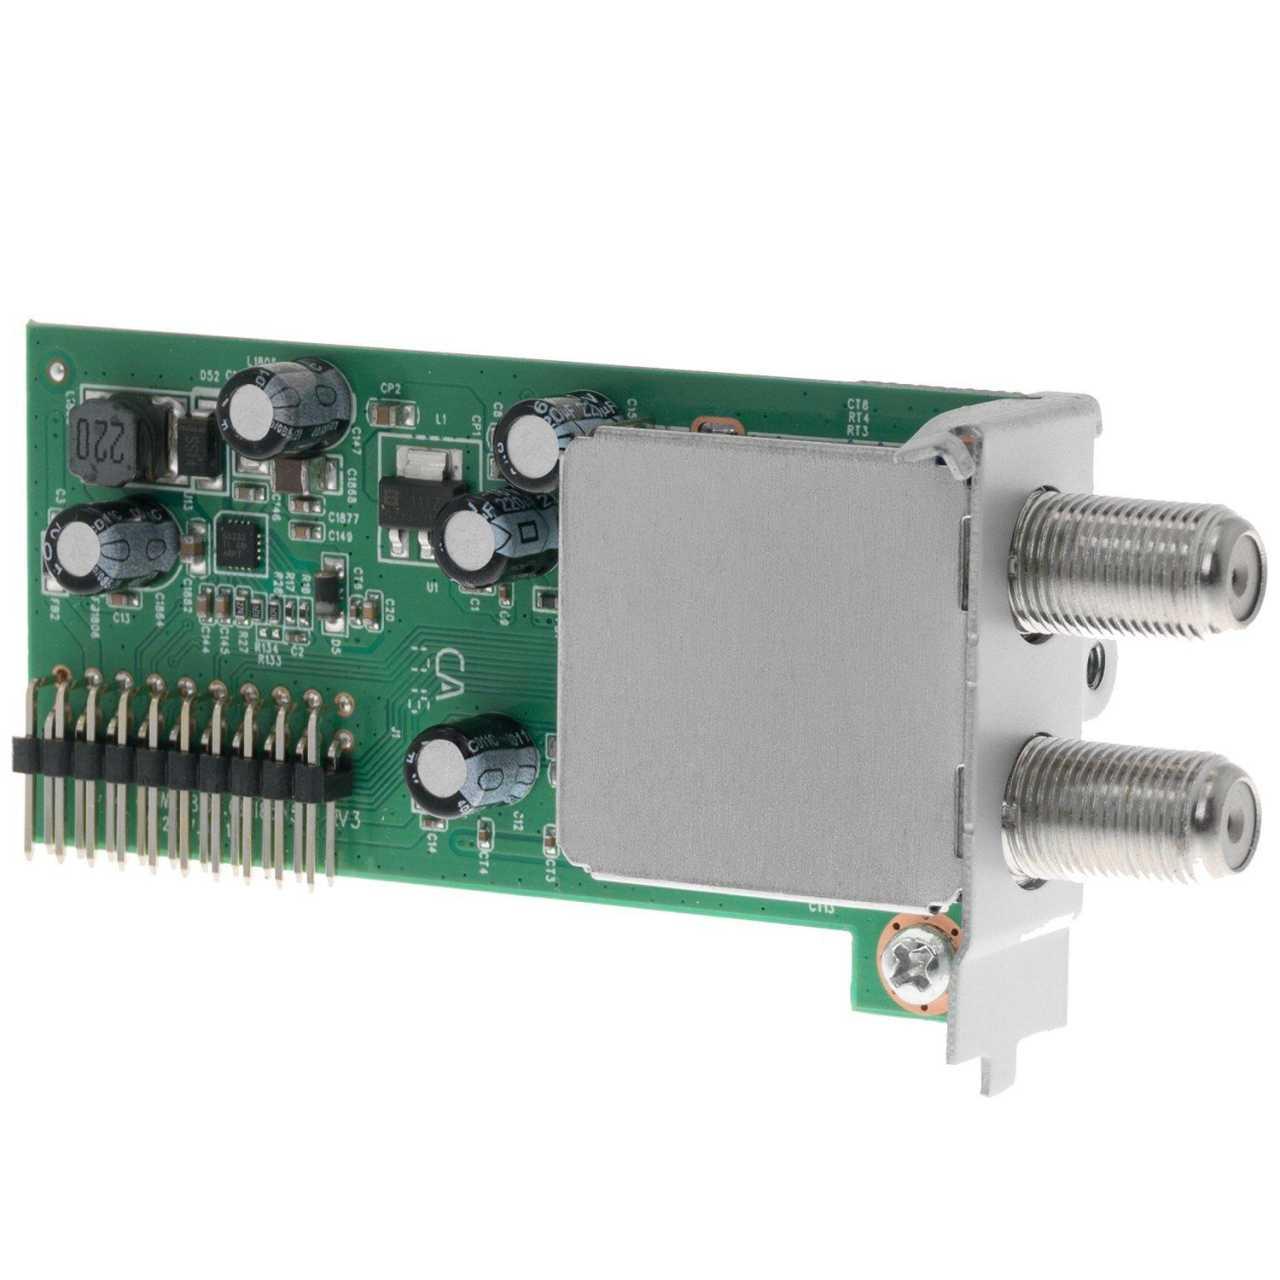 AX Technology AX / Mutant 4K-Box HD51 DVB-S2X Single 4K HDTV Sat Plug&Play Tuner AXTZUB004